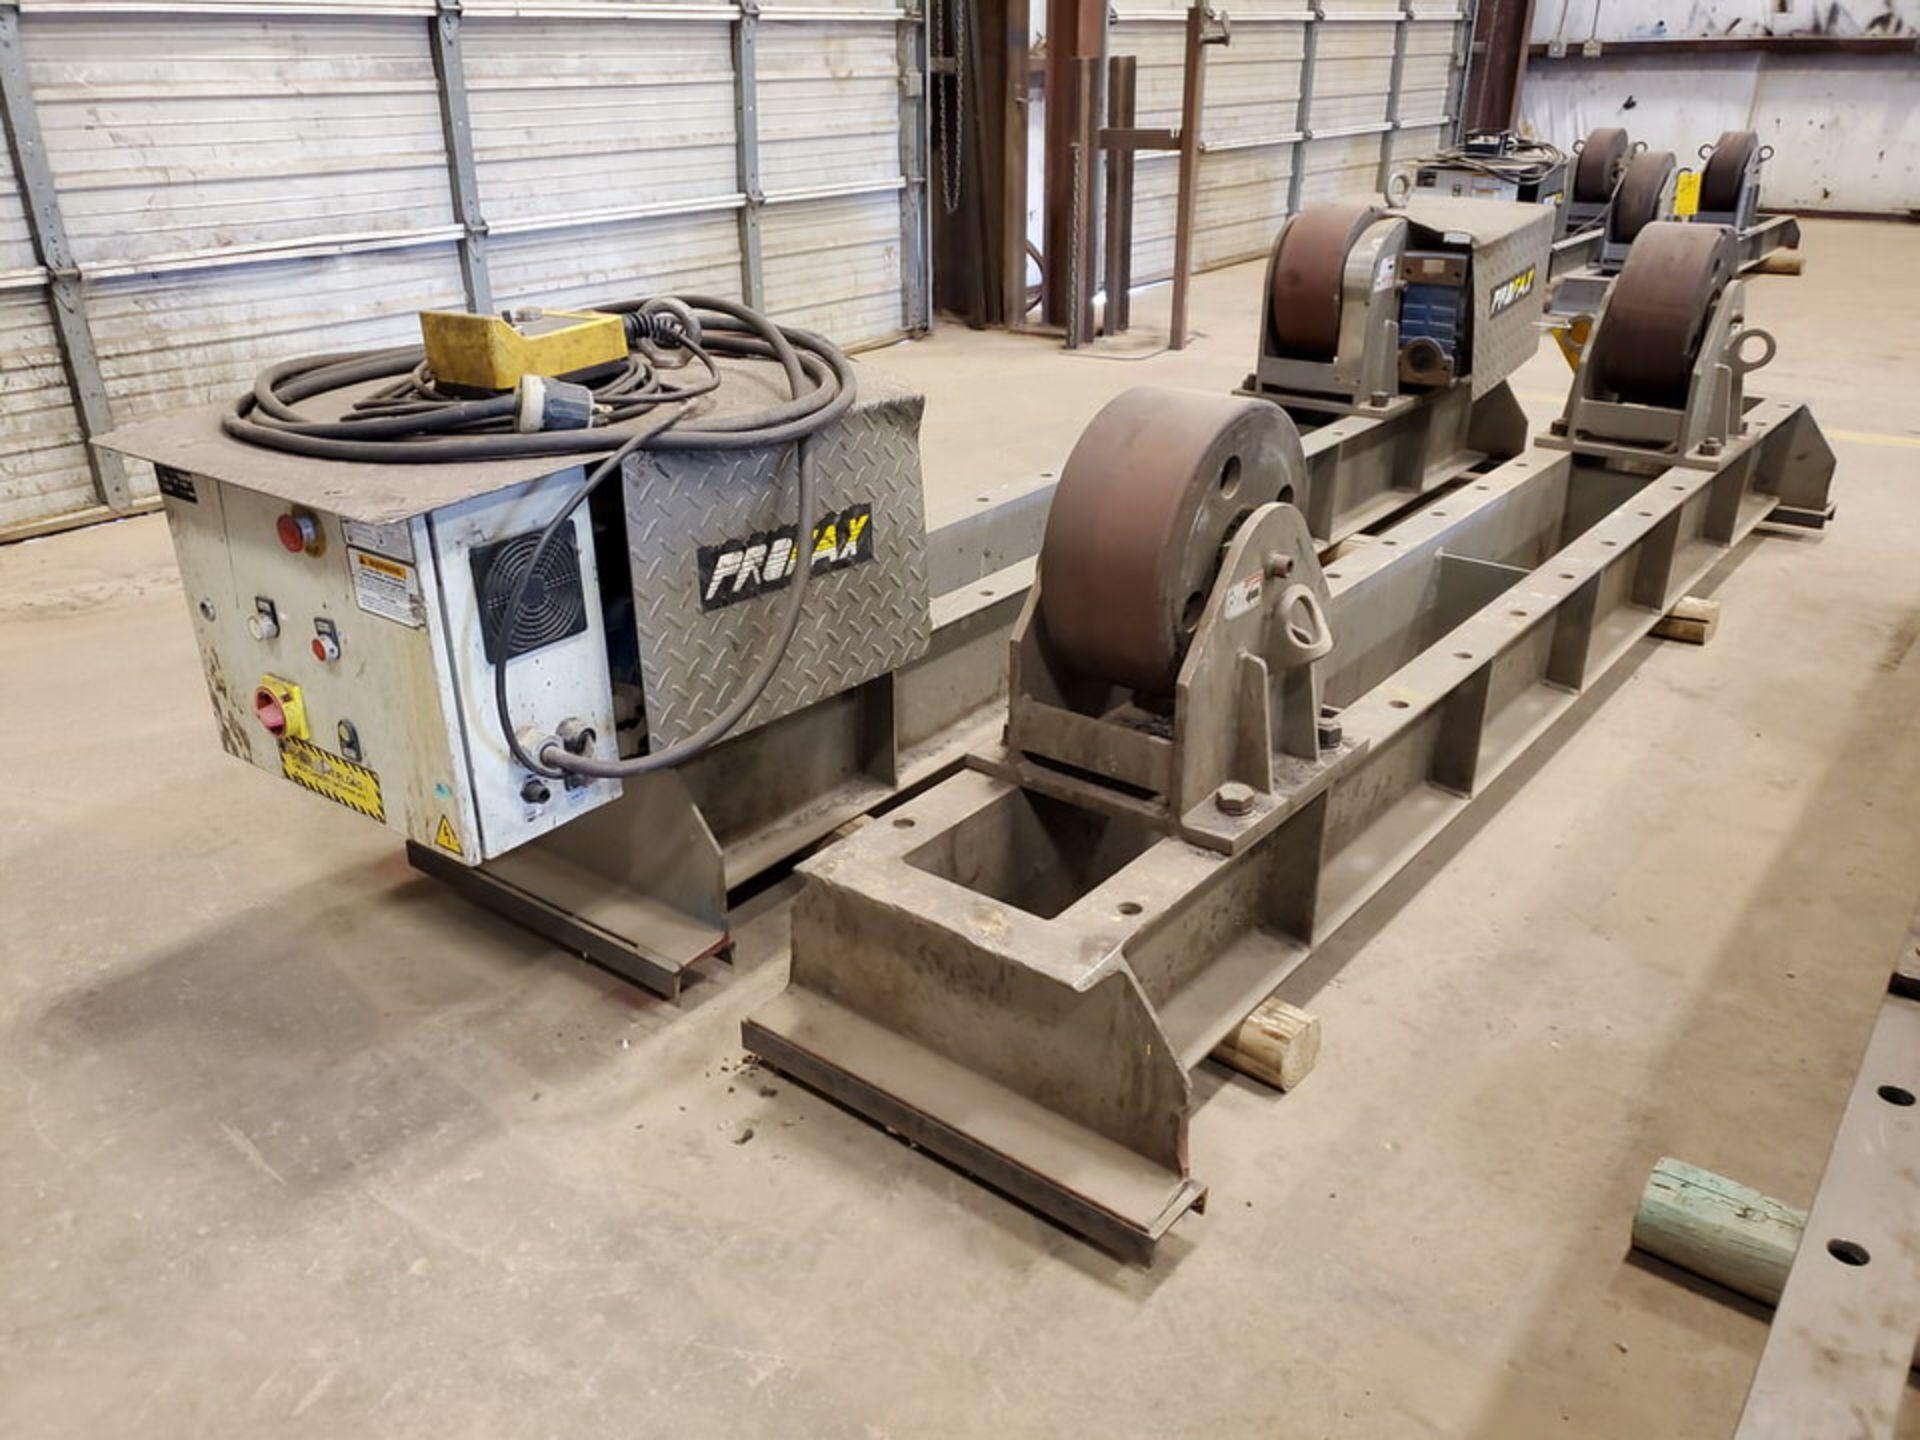 "Profax TR-40000 Turn Roll 20H Cap., 440V, 15A, 50/60HZ, 3PH, RPM: 0-1.7, 6"" Wheel Dia. - Image 4 of 8"